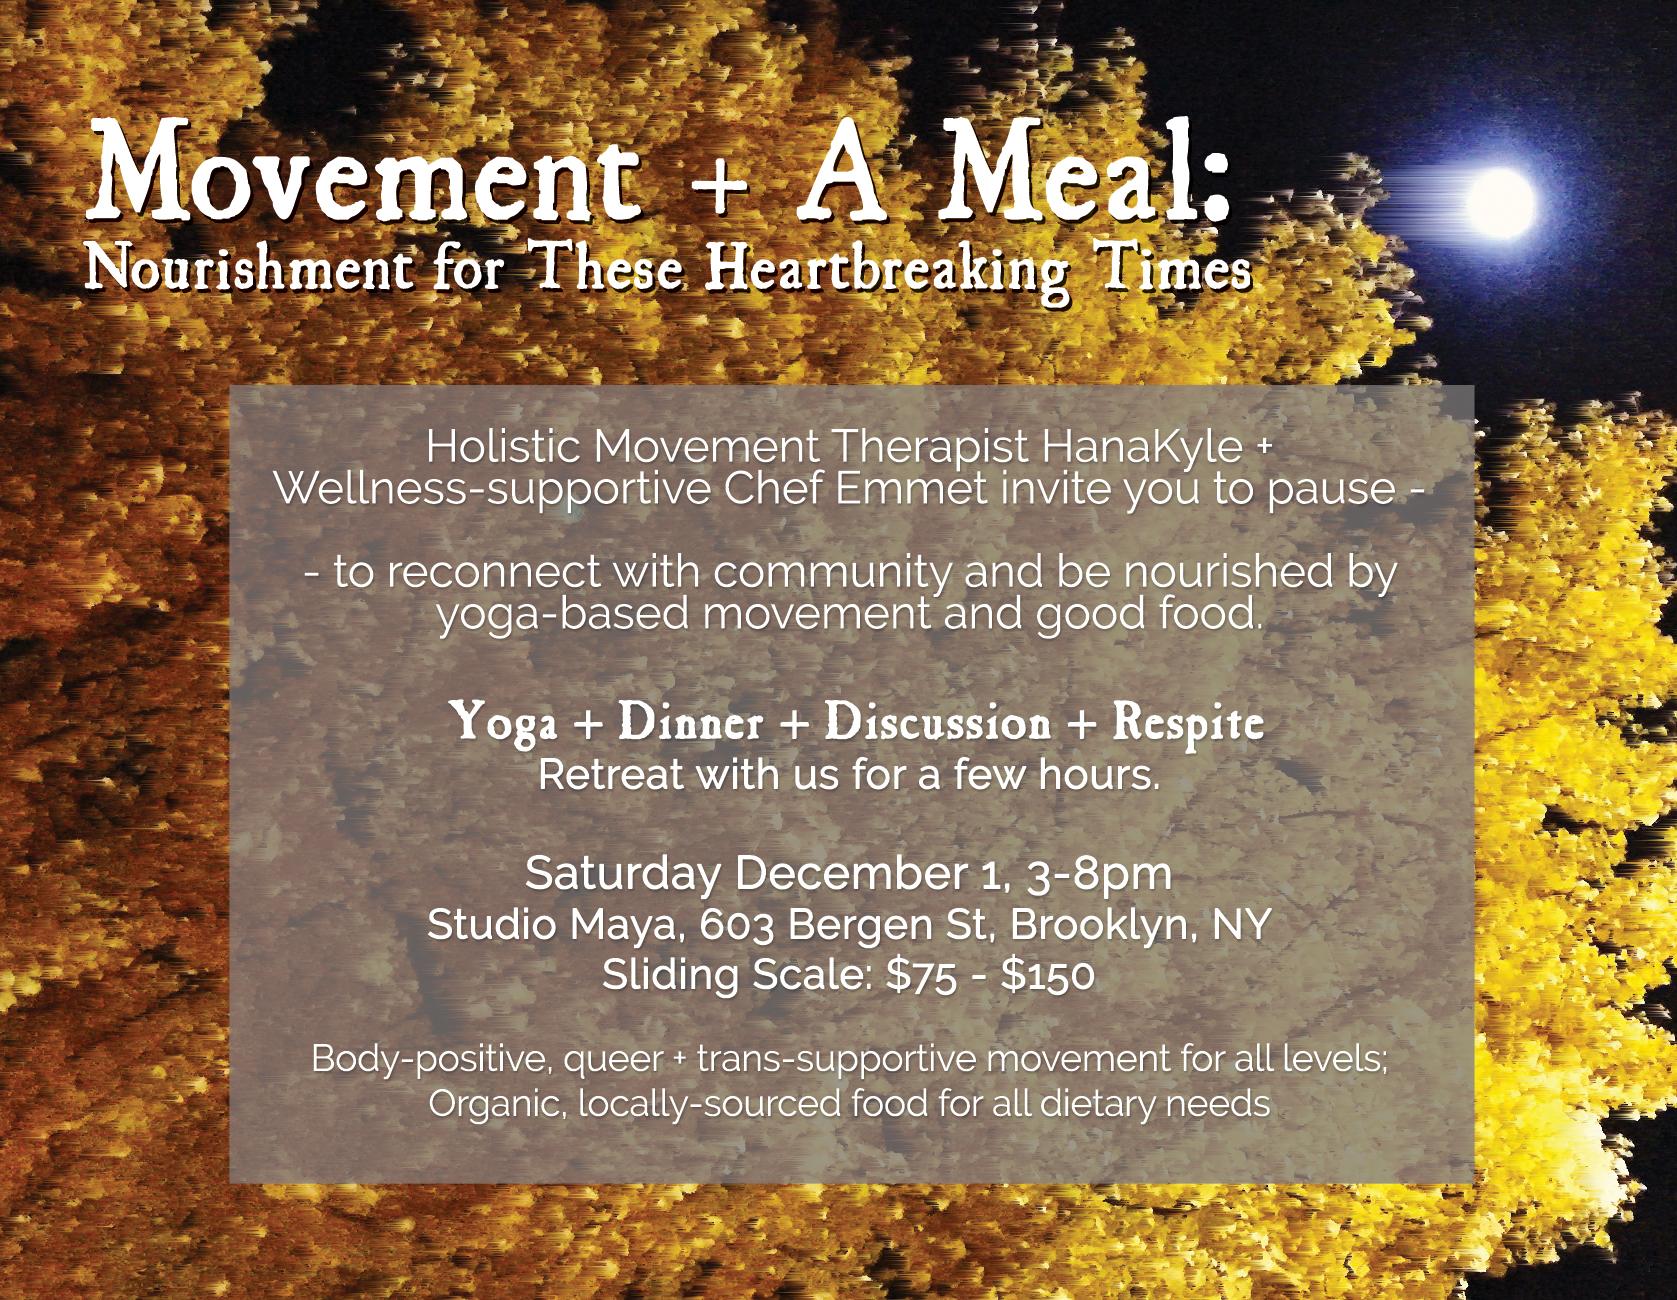 Movement Meal Mini Retreat